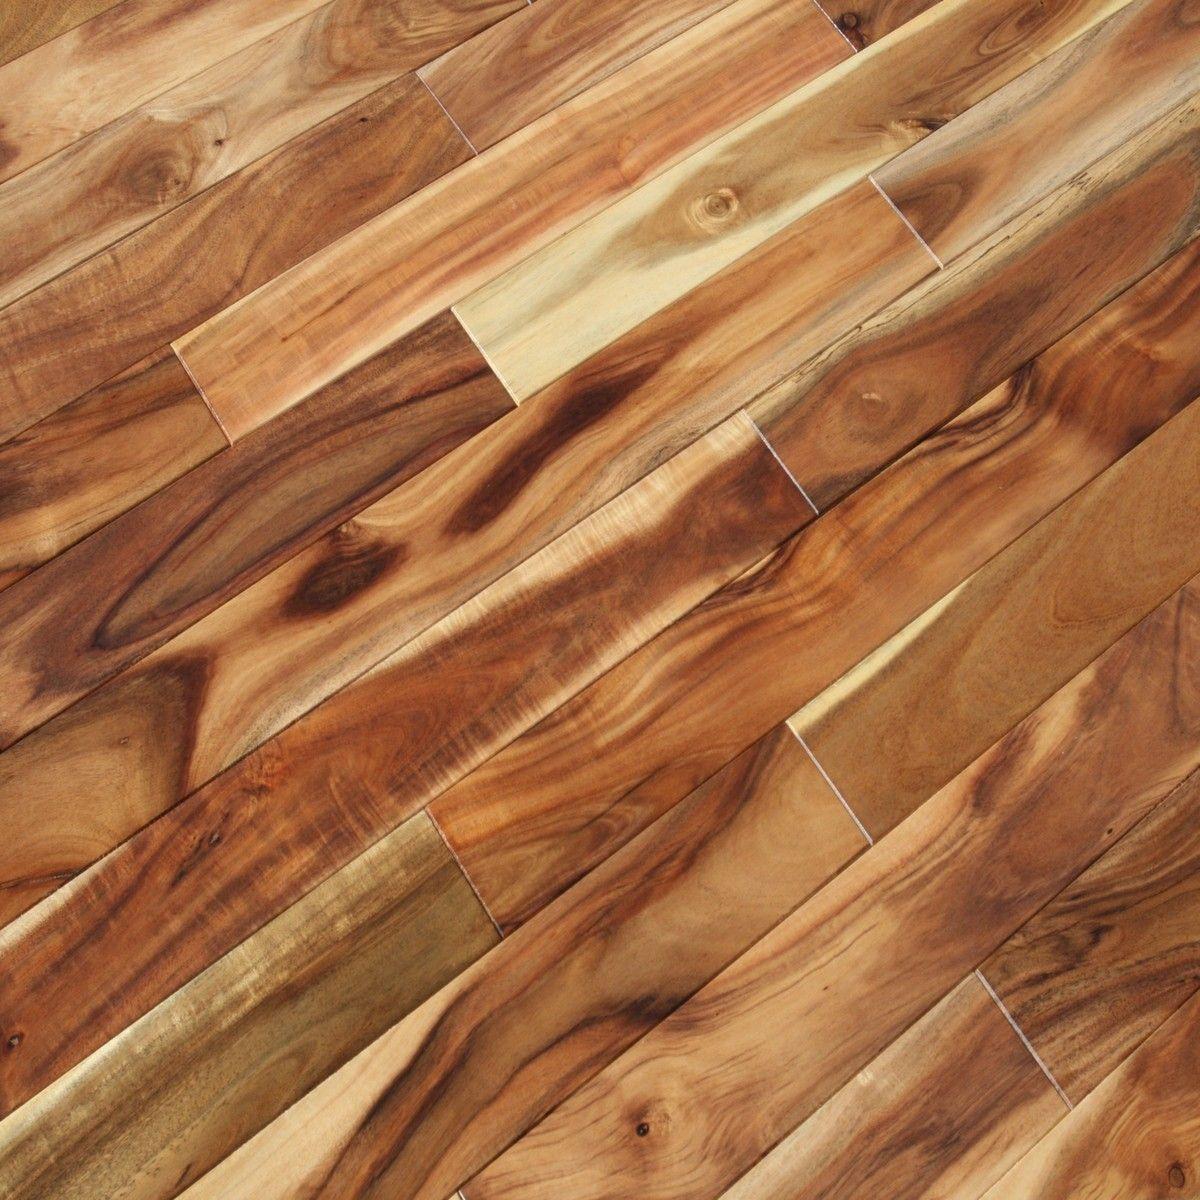 tobacco road acacia hardwood flooring of acacia asian walnut blonde hardwood flooring prefinished solid intended for acacia asian walnut blonde hardwood flooring prefinished solid hardwood floors elegance plyquet